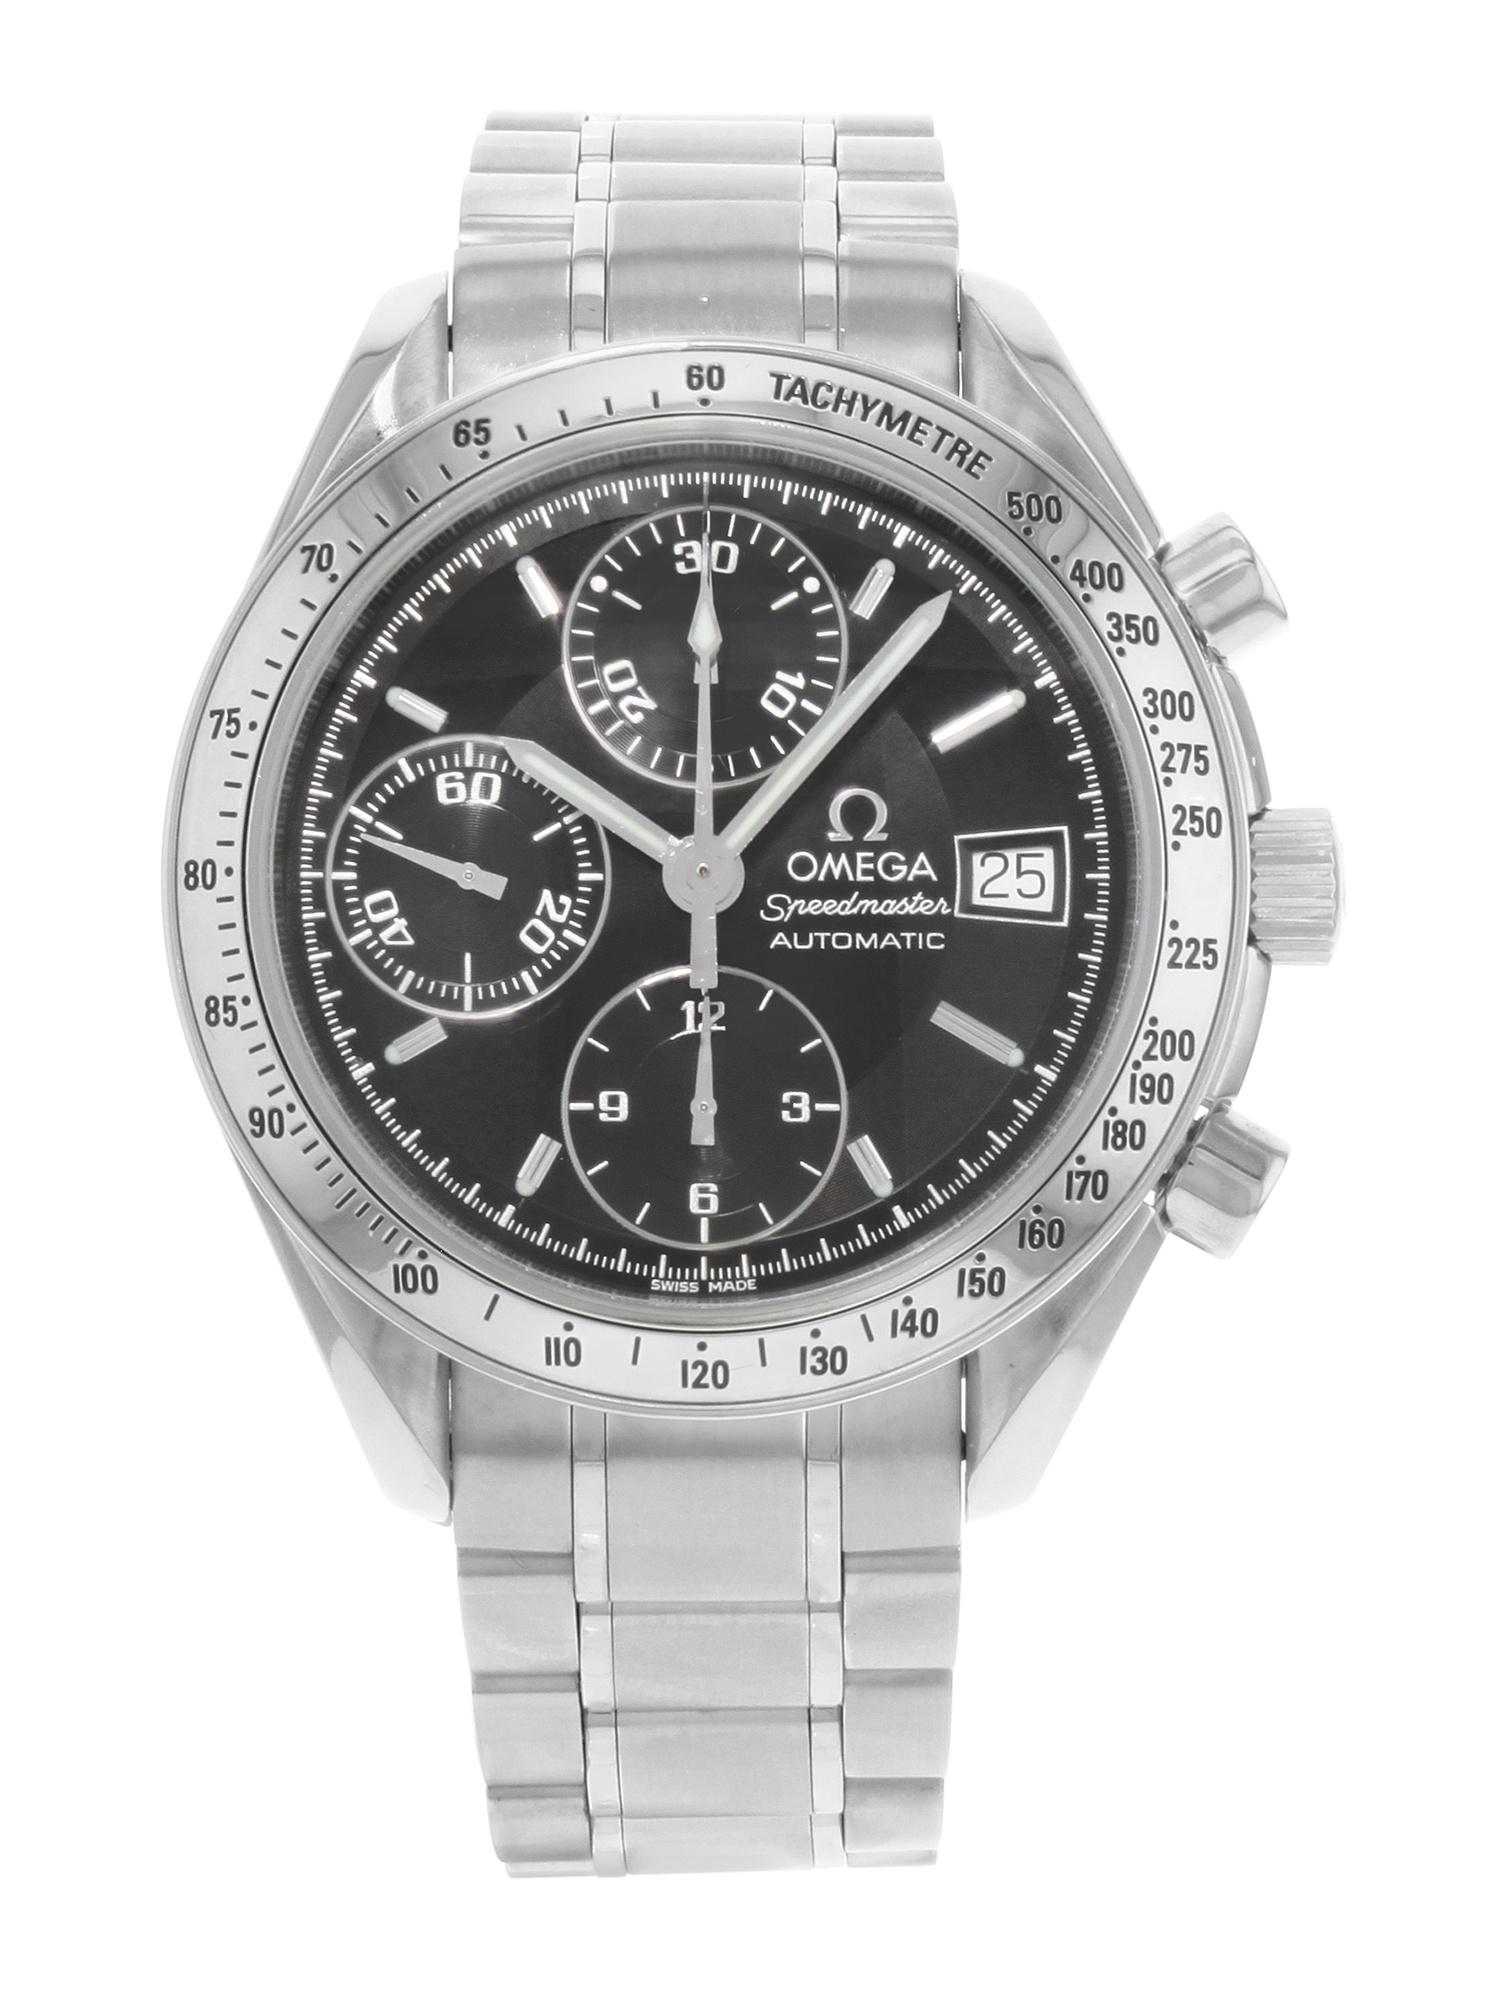 Omega Speedmaster Chrono Black Dial Steel Automatic Mens Watch 3513.50.00